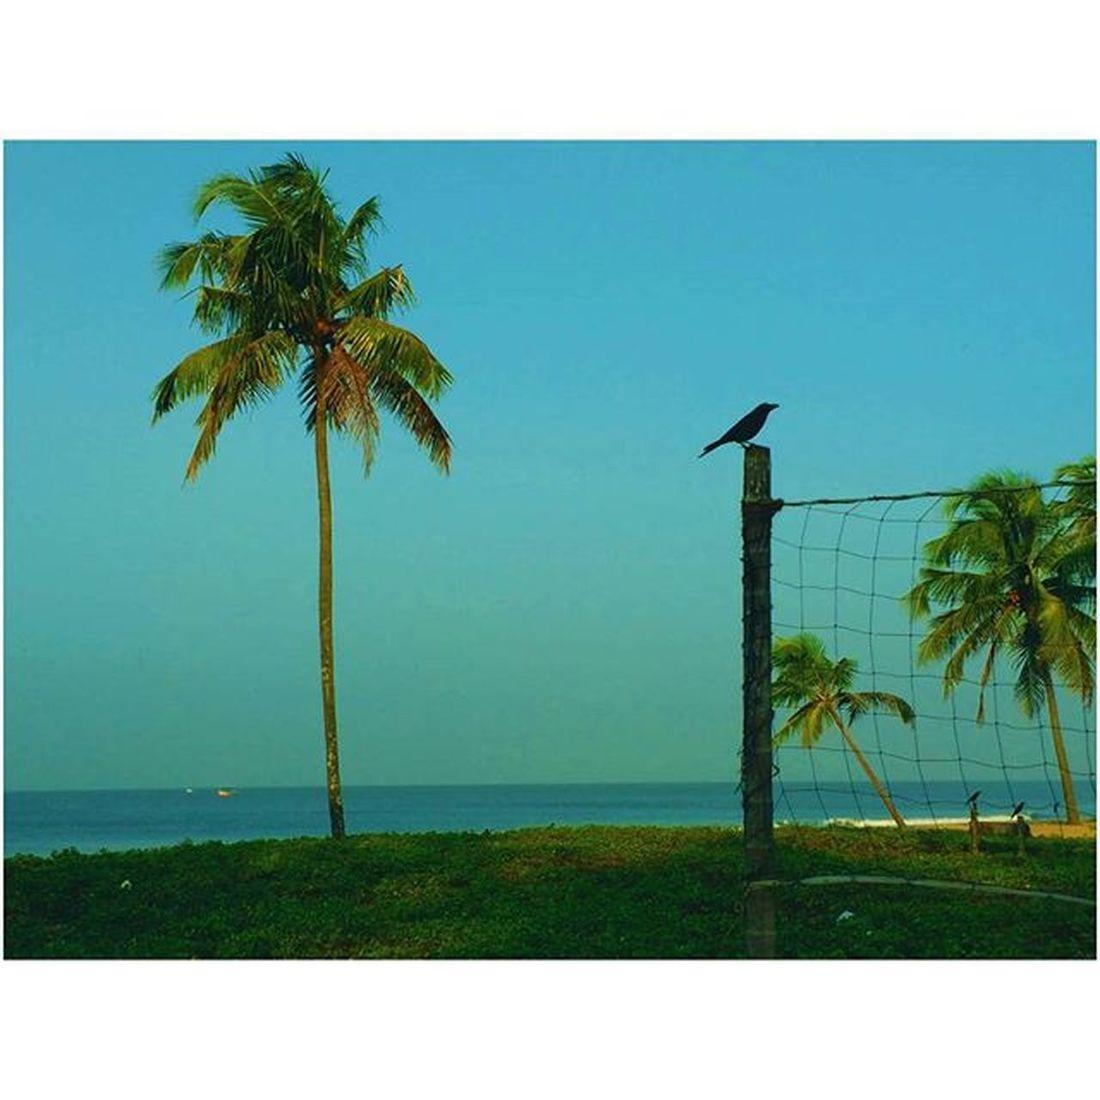 Sky Skyporn Instasky Clearbluesky Beachview Instabeach Beach Sea Mesmerizingsky Crow VSCO Igers Photooftheday Mobilephotography Nature Naturelovers Instanature Instagood Likes4likes Pastel Power